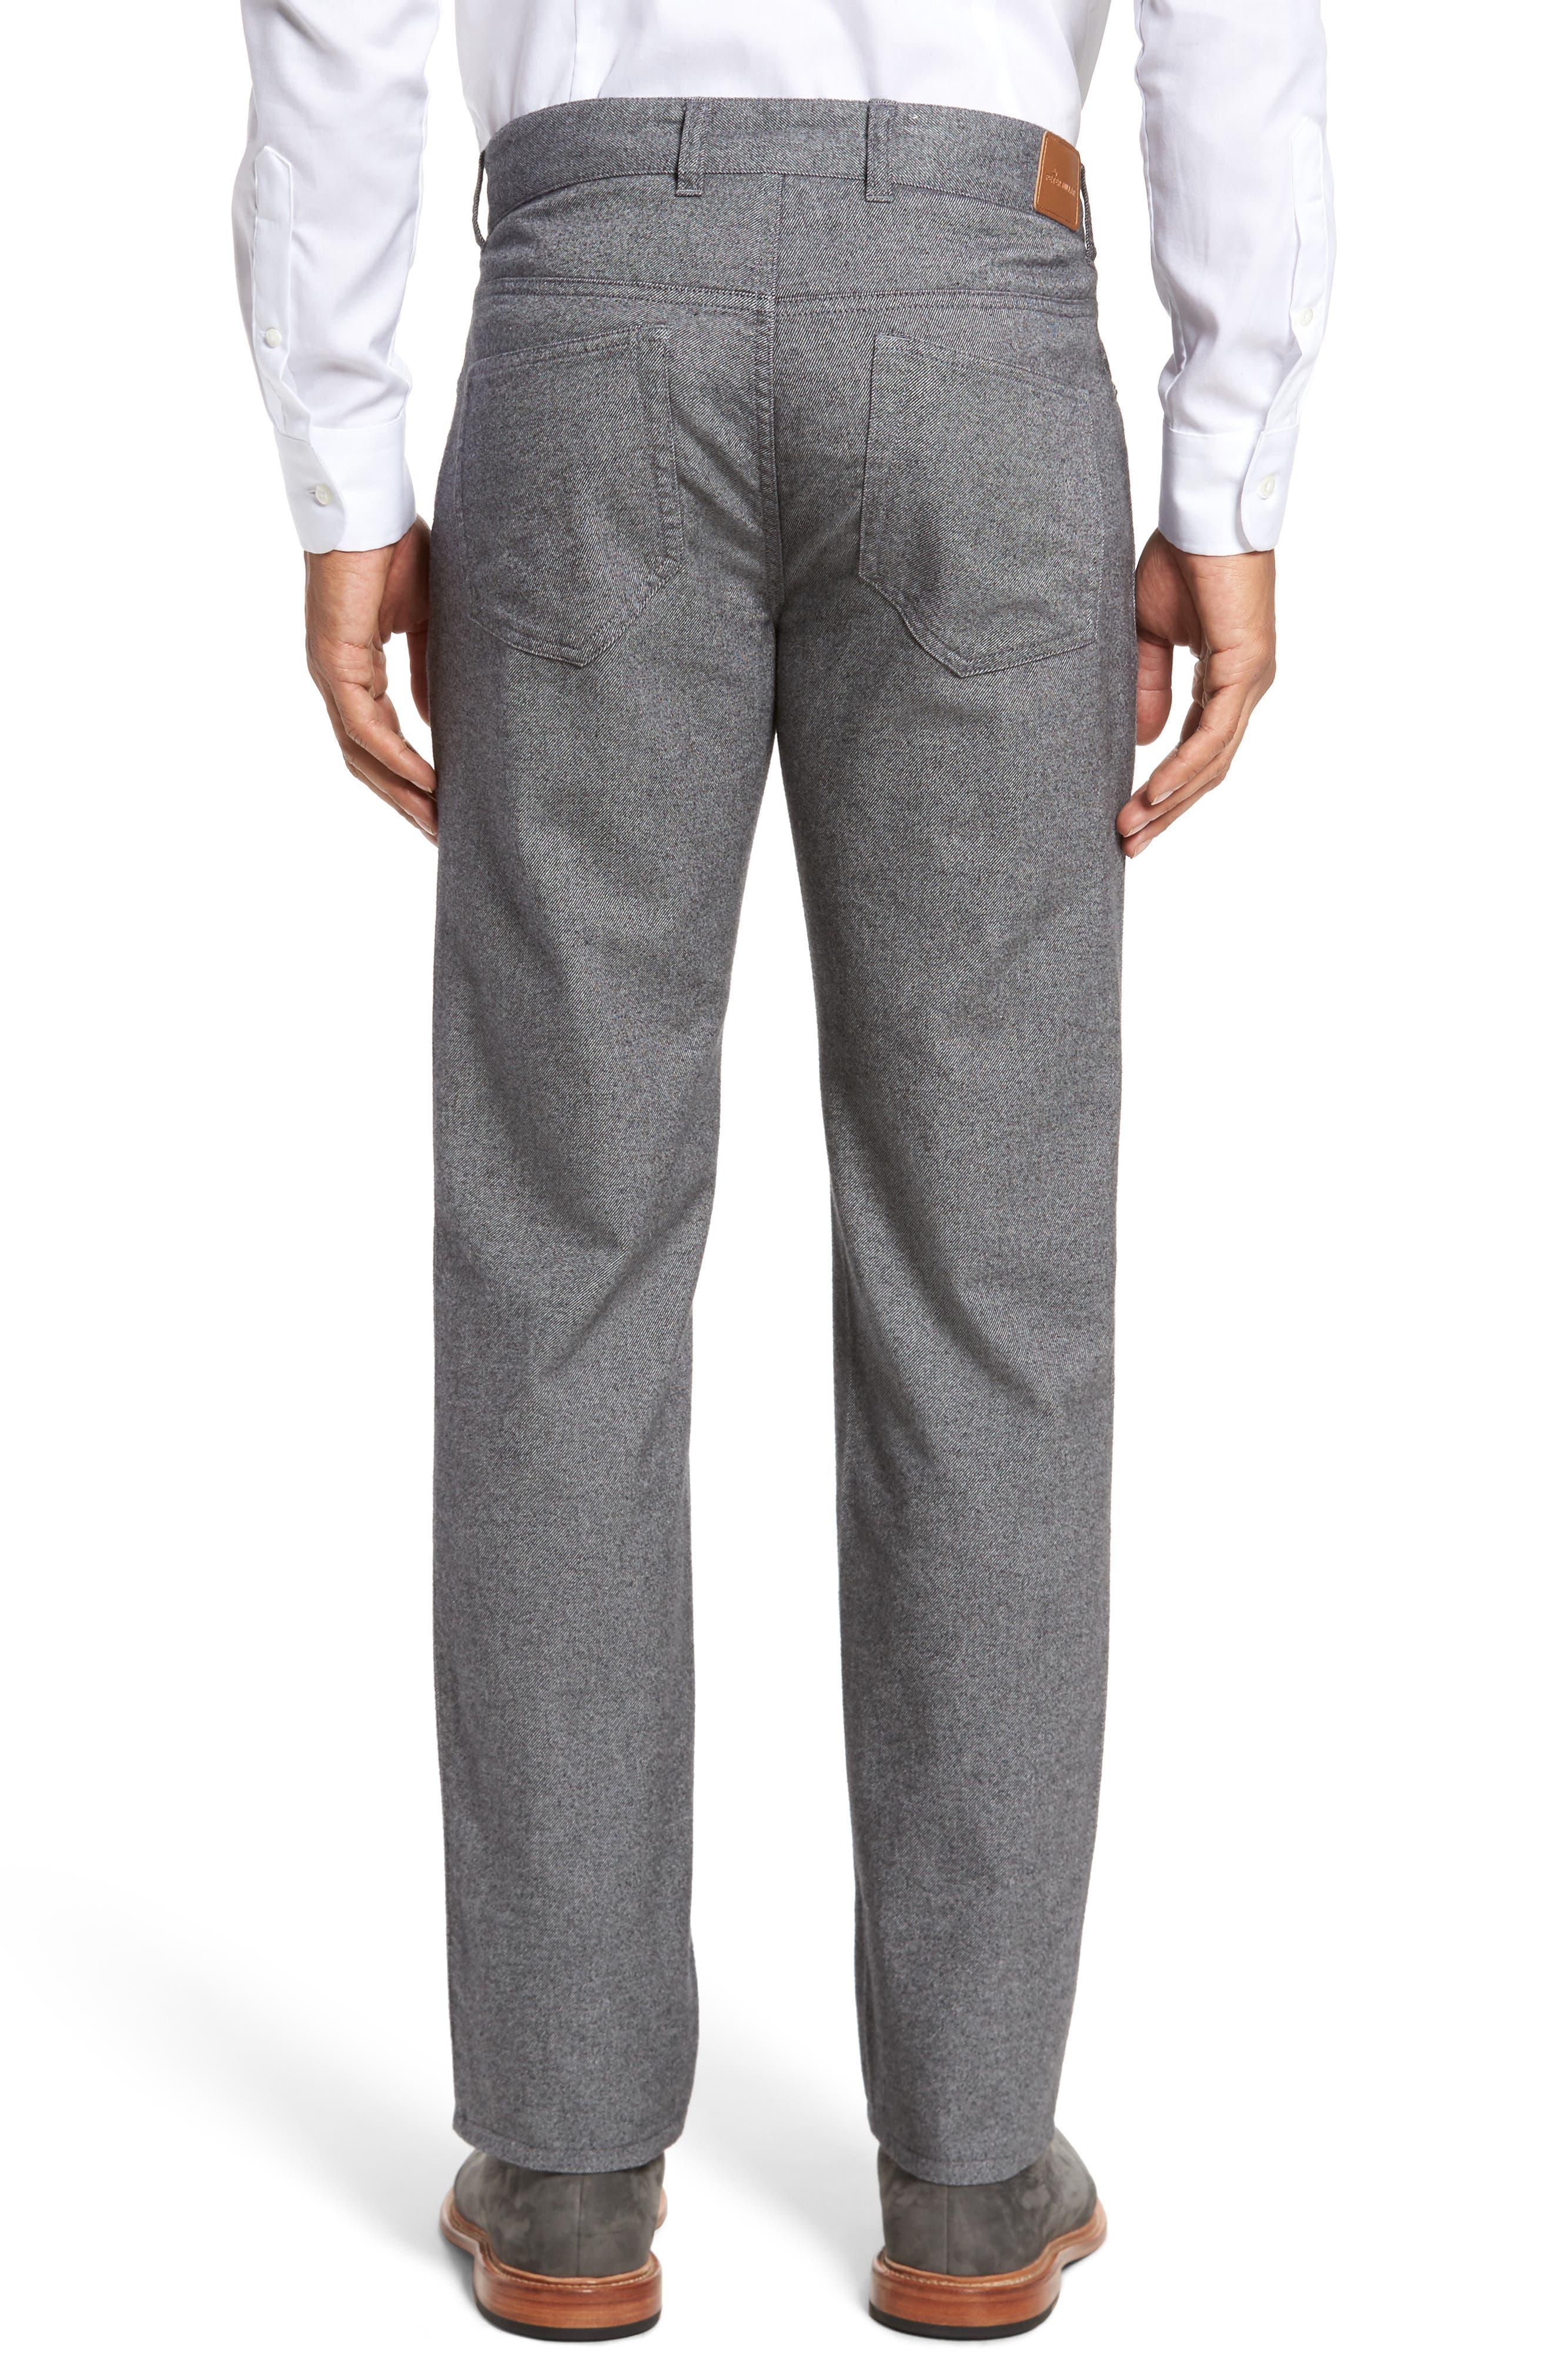 Mountainside Flannel Five-Pocket Pants,                             Alternate thumbnail 2, color,                             033